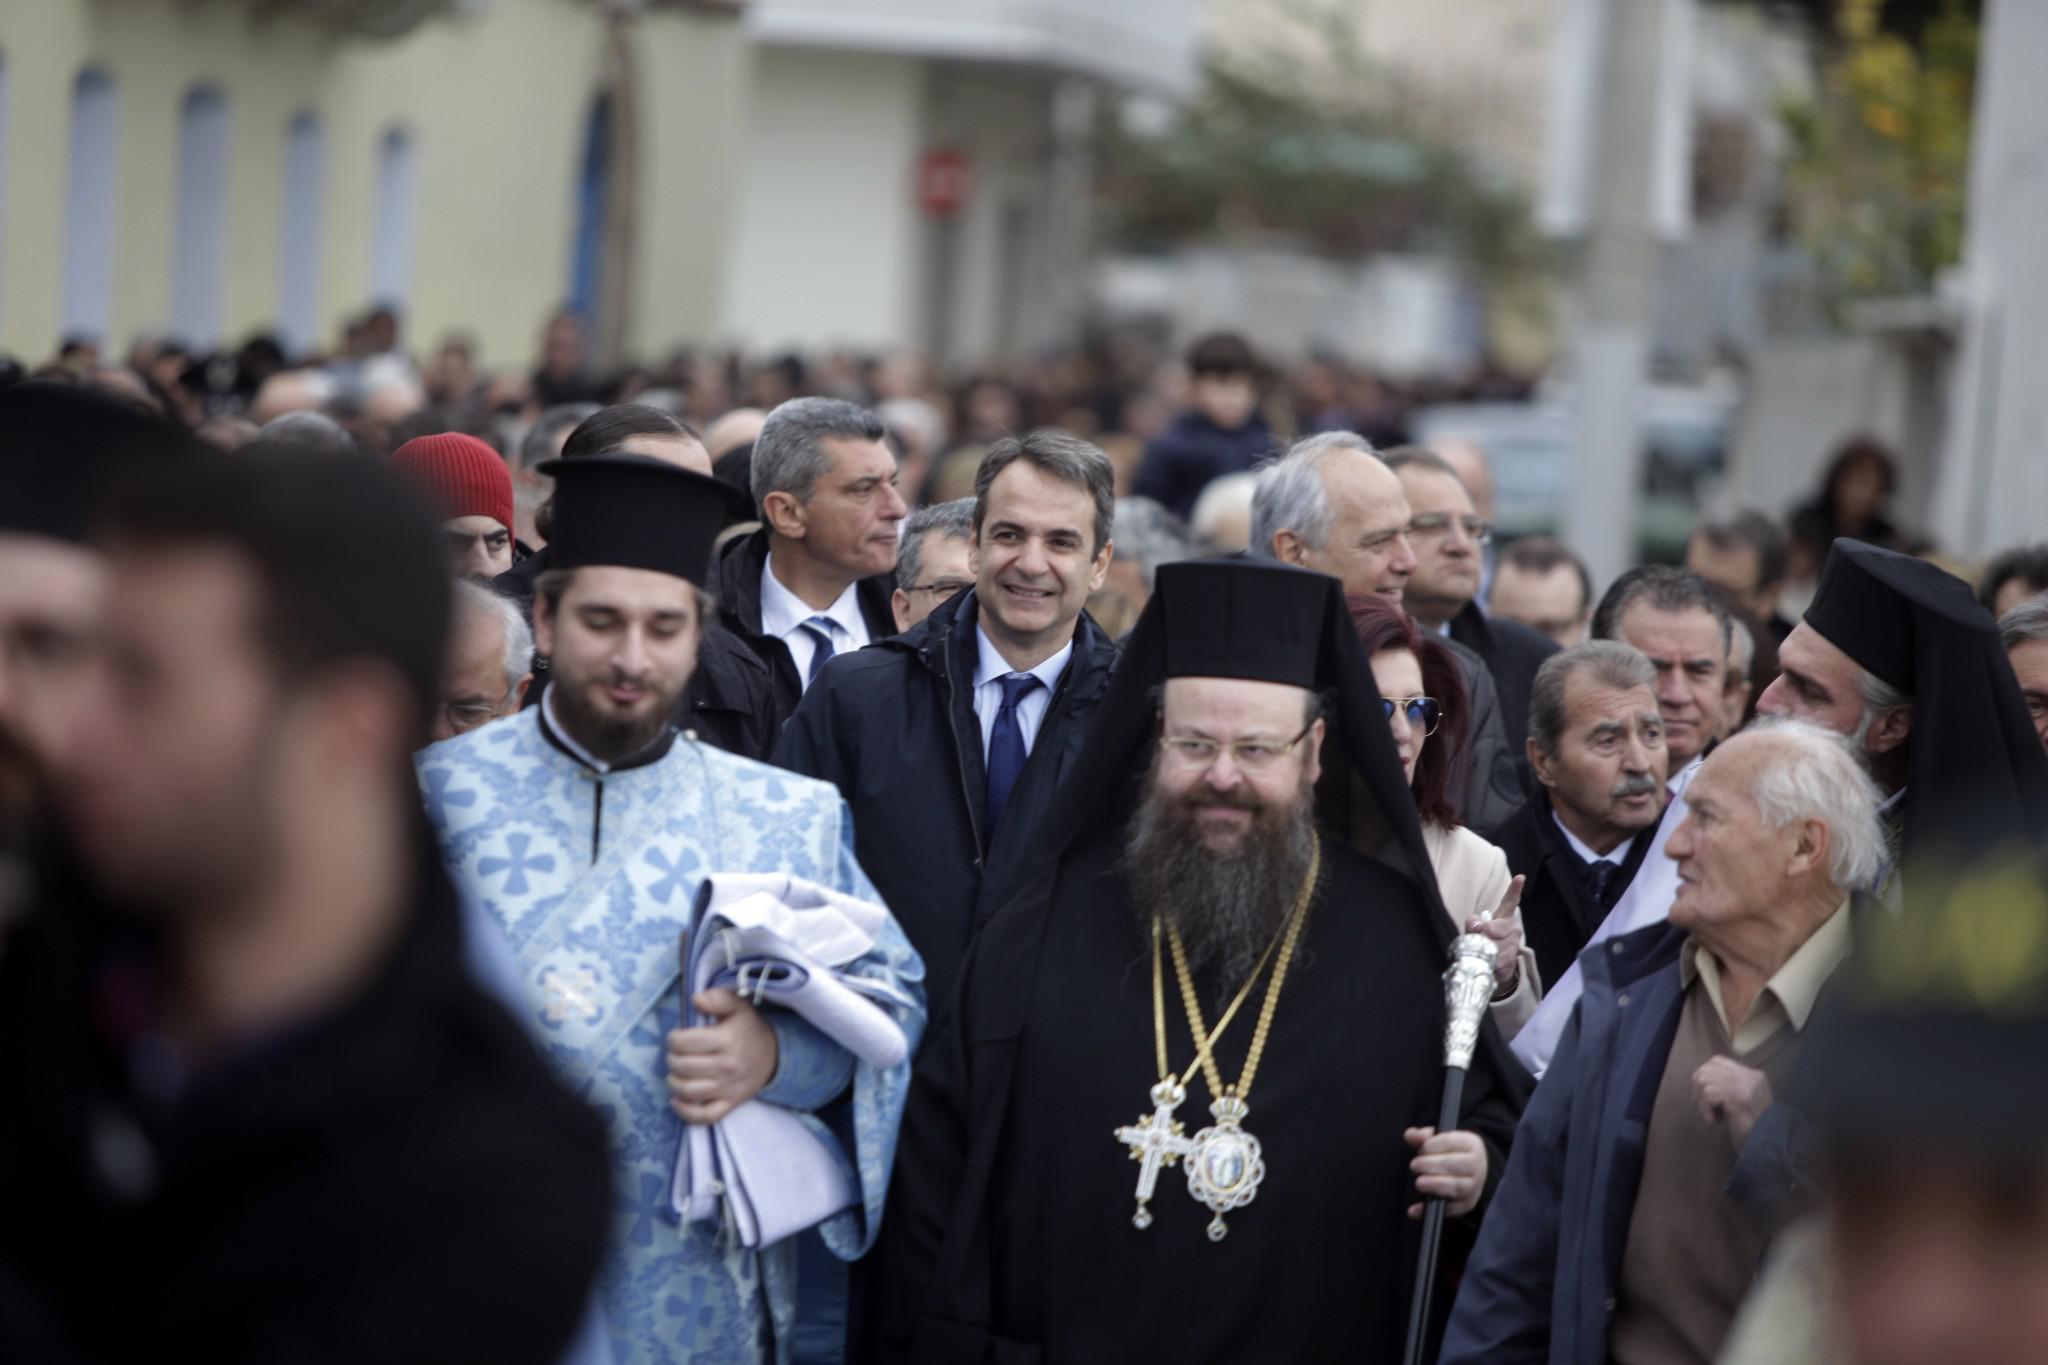 mitsotakis10-500 Μητσοτάκης: Είναι άμεση η ανάγκη για ενότητα [εικόνες]